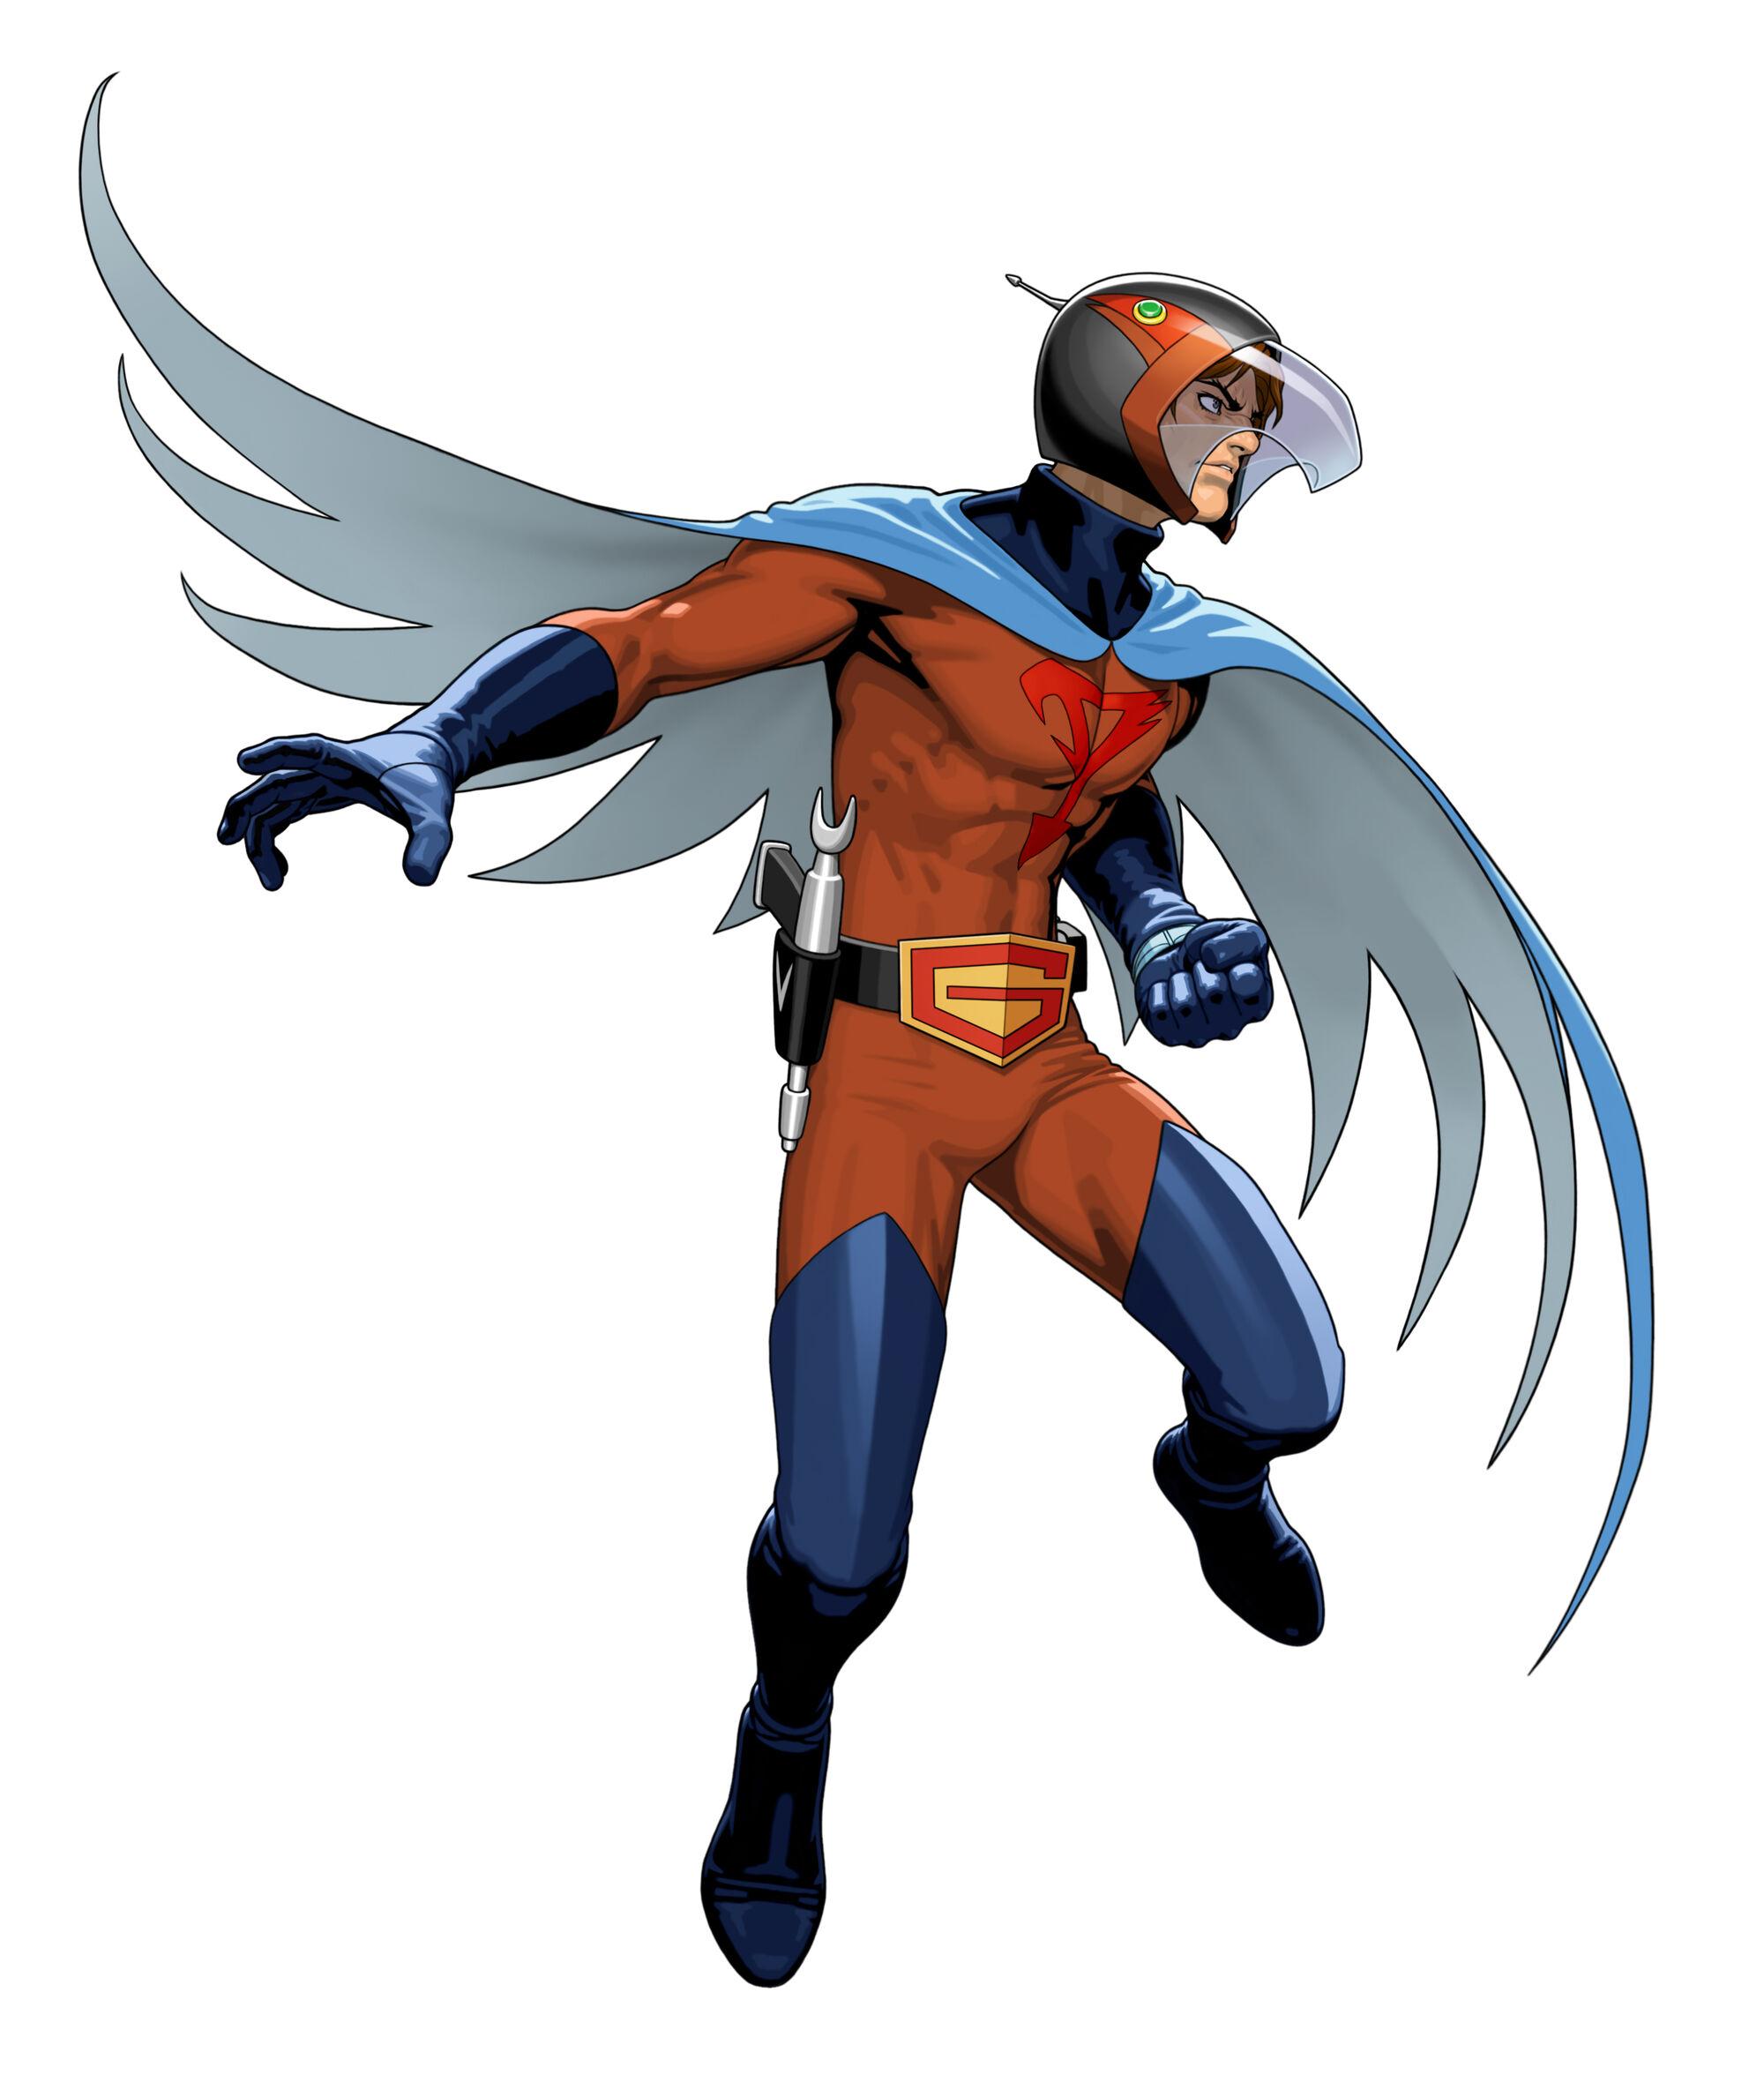 G Force Cartoon Characters : Joe asakura gatchaman wiki fandom powered by wikia